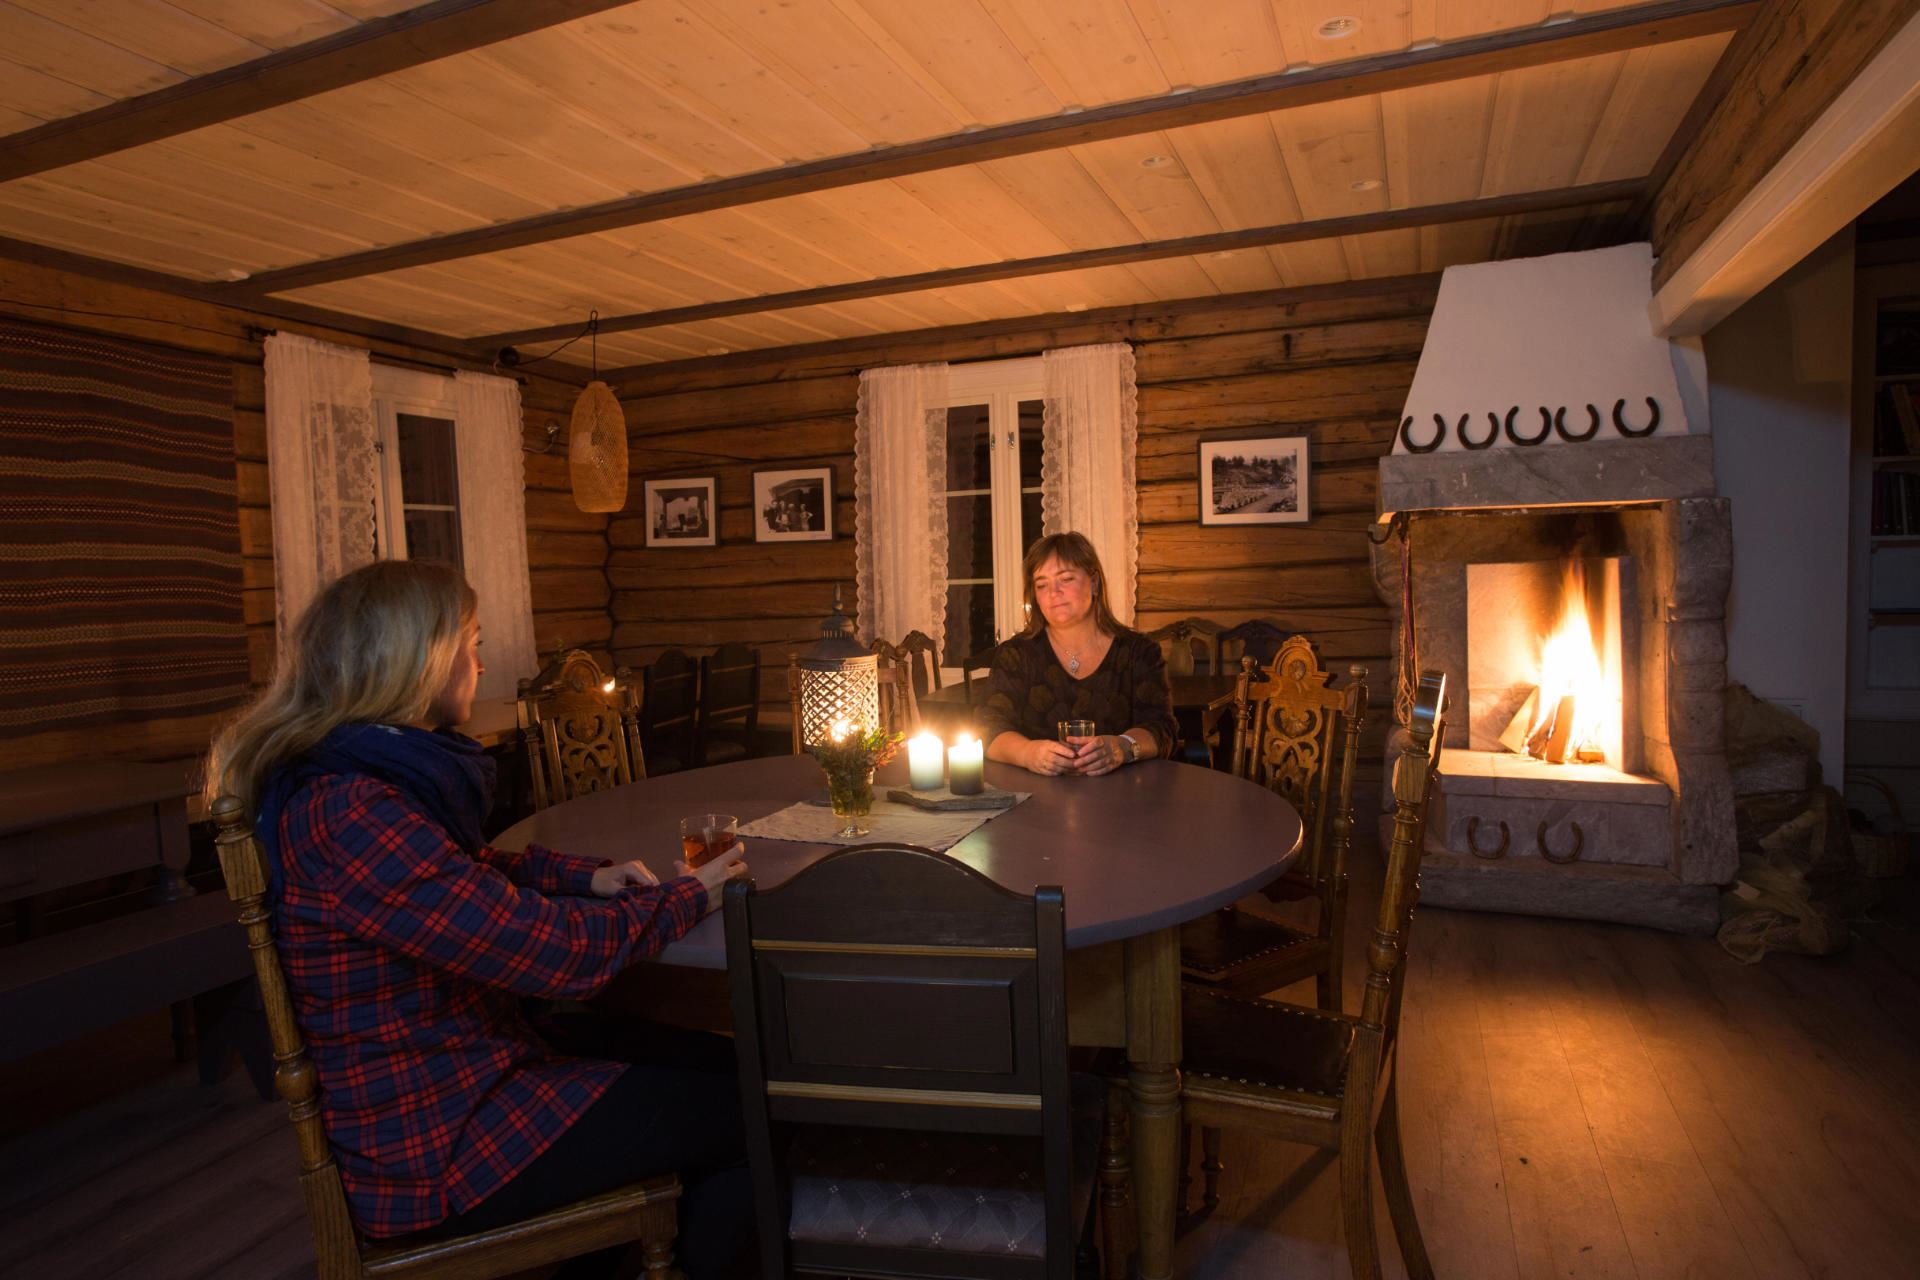 Foto: Mari Valen Høihjelle, Foto: Mari Valen Høihjelle